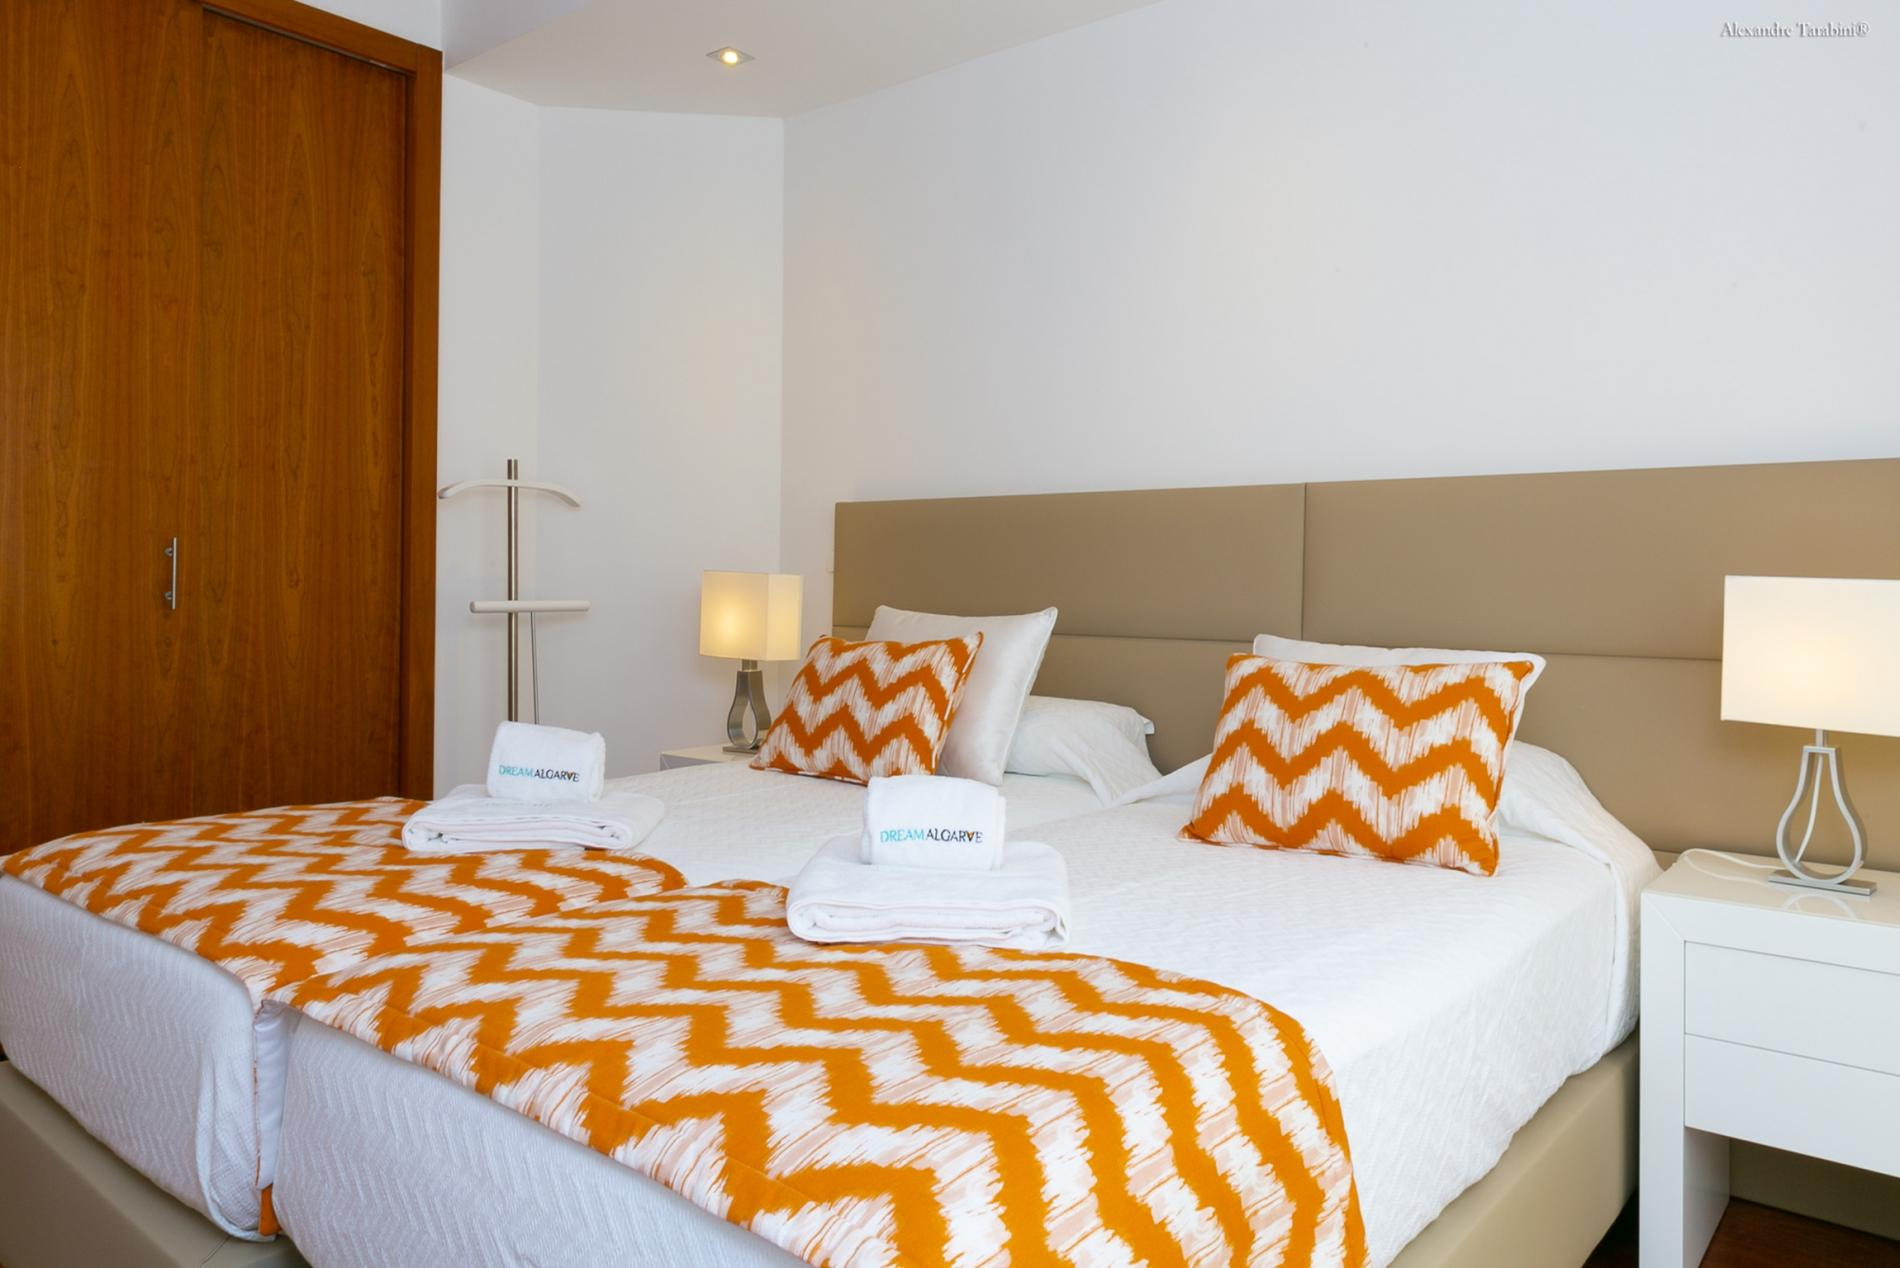 Ferienwohnung B29 - LuzBay Duplex (2558092), Luz, , Algarve, Portugal, Bild 10